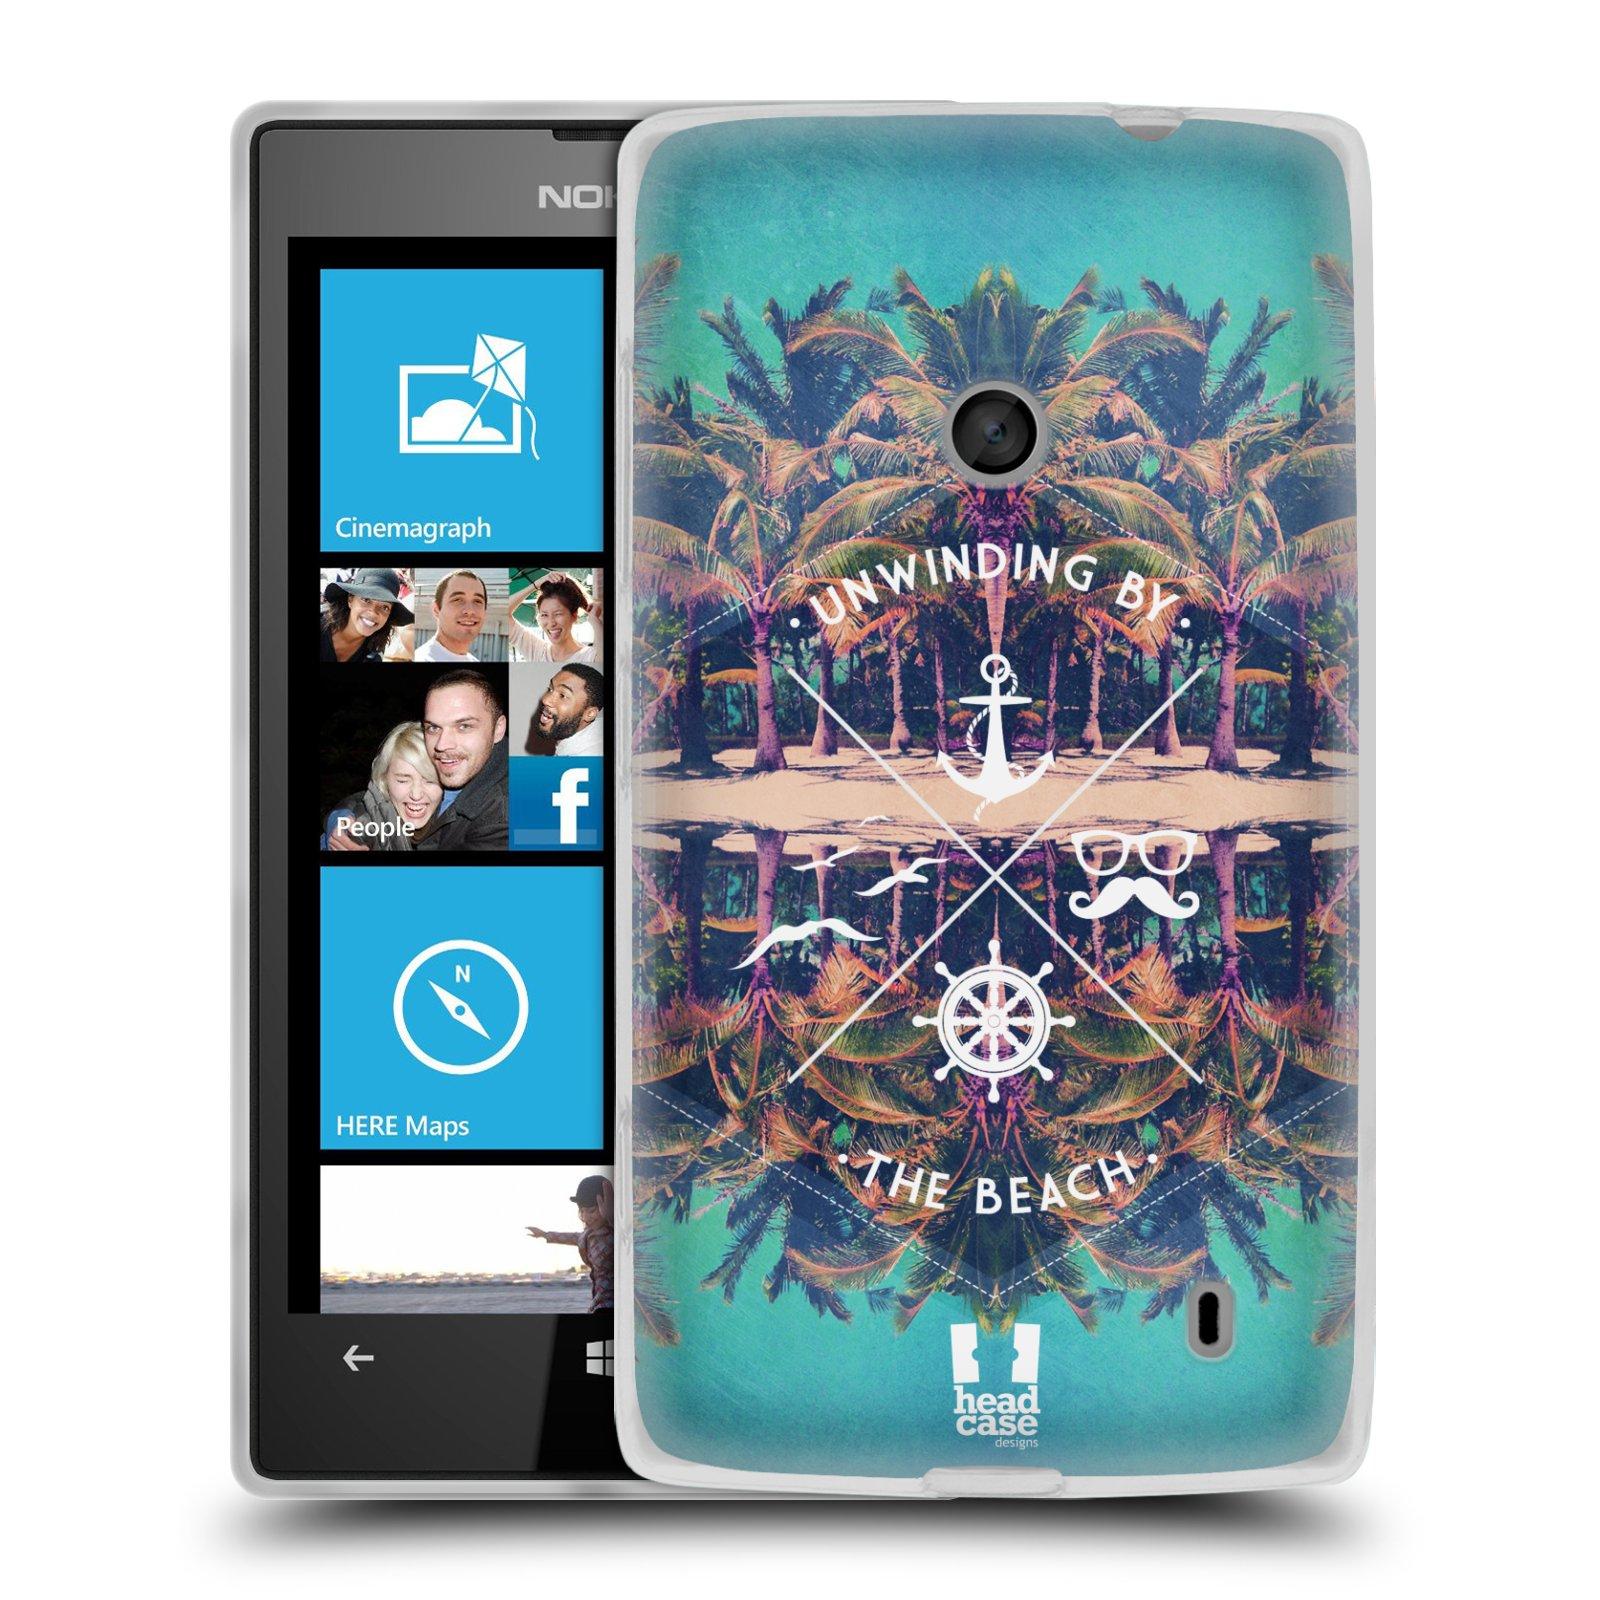 Silikonové pouzdro na mobil Nokia Lumia 520 HEAD CASE Bezvětří (Silikonový Kryt či obal na mobilní telefon Nokia Lumia 520)